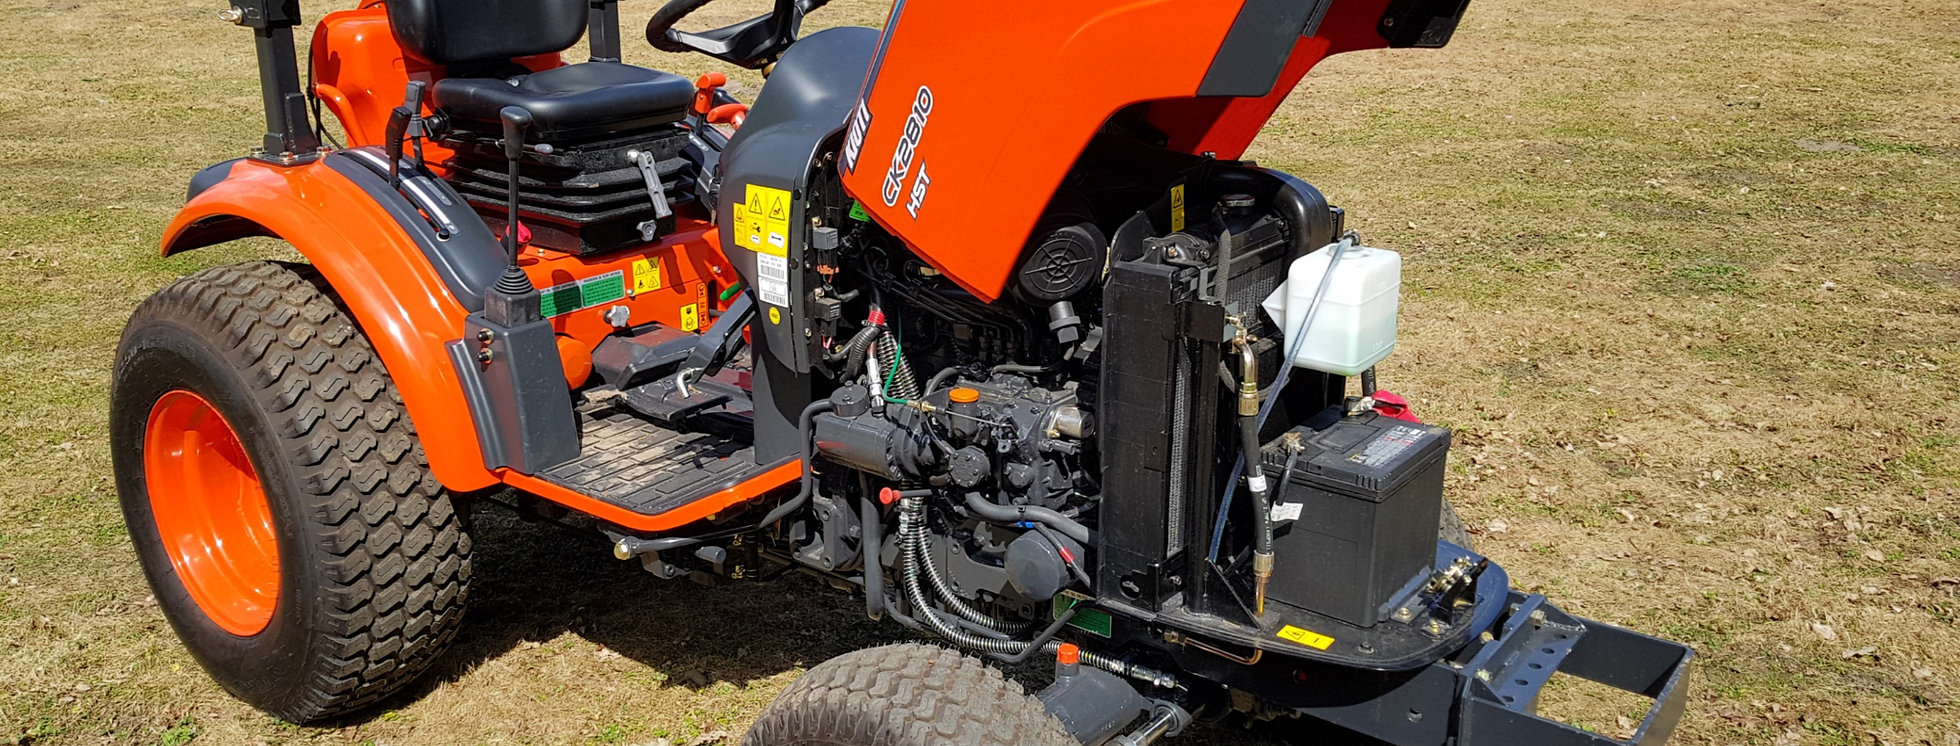 Kioti CK2810 Hydrostatic Compact Tractor For Sale UK